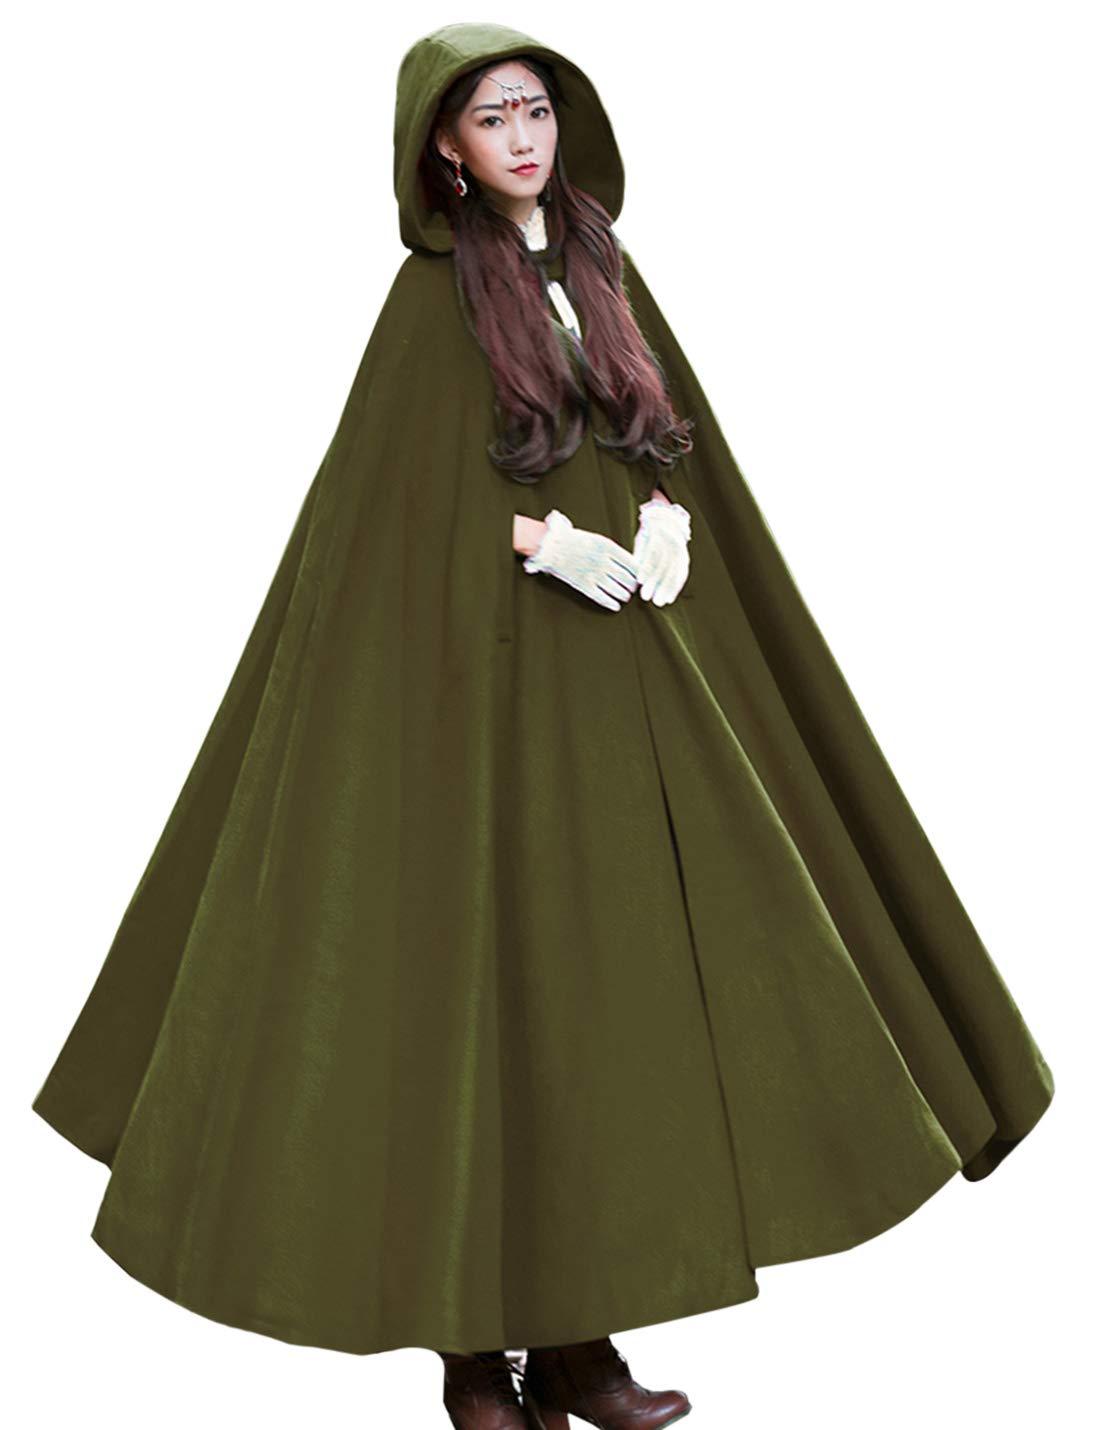 Gihuo Women's Wool Blend Hooded Cape Poncho Maxi Cloak Coat